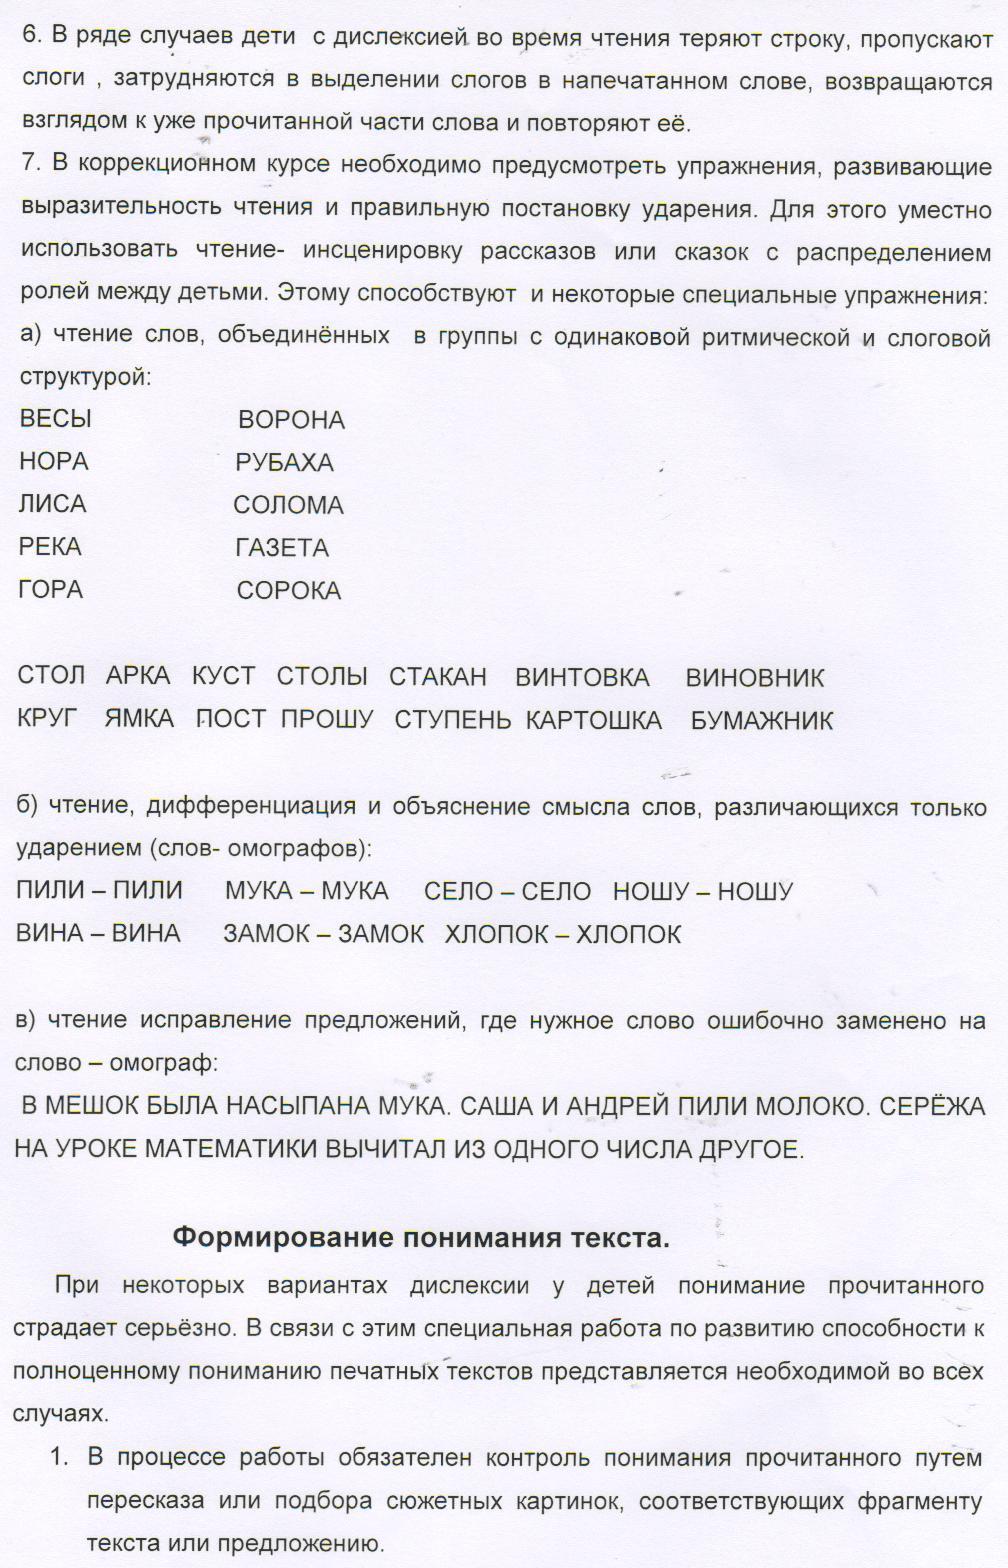 C:\Documents and Settings\Администратор\Рабочий стол\Тептякова Е.А. 010.jpg